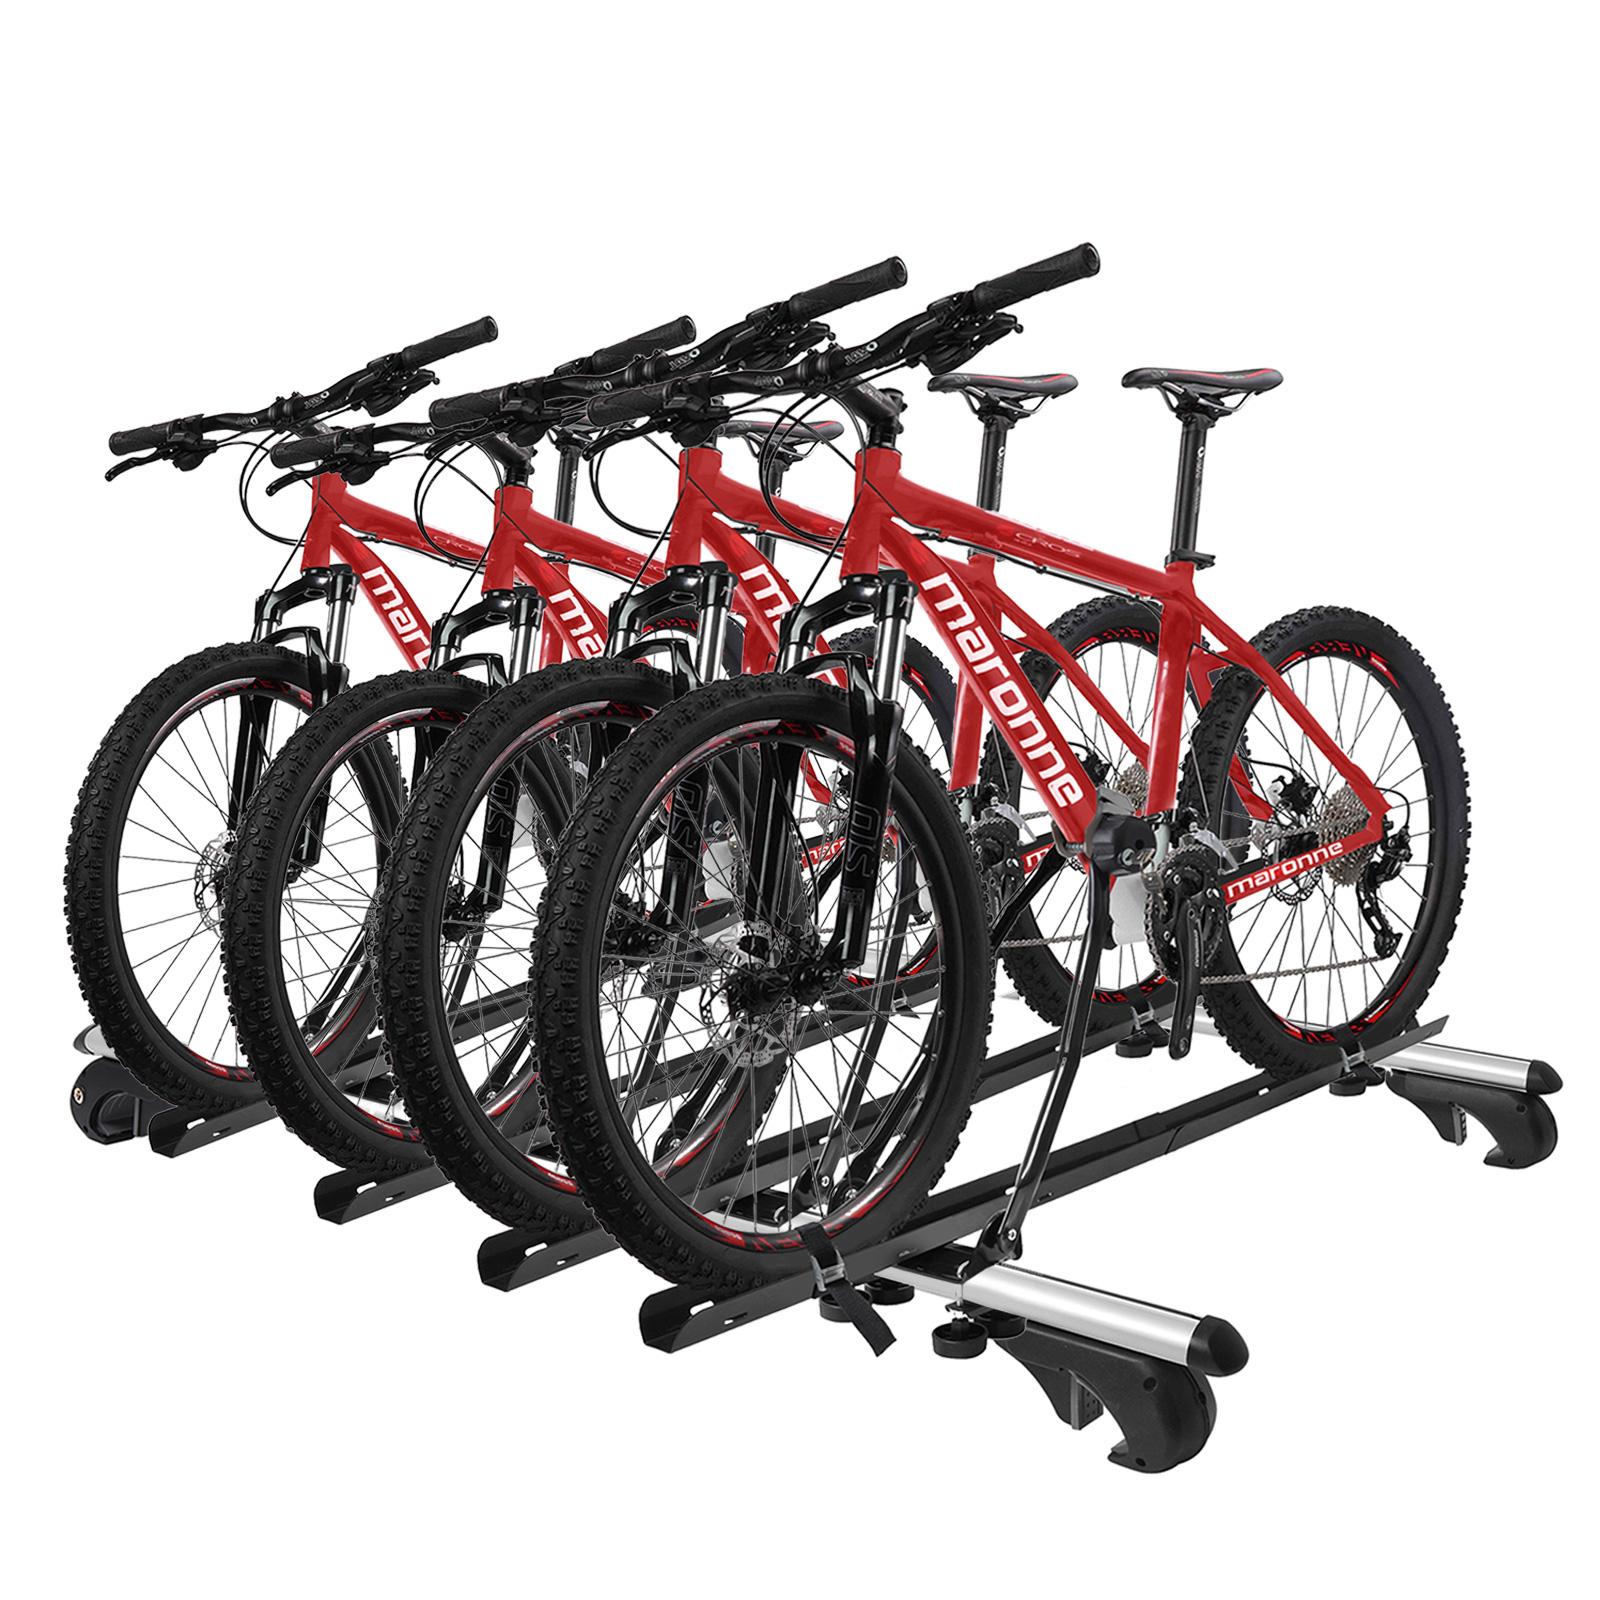 4x fahrradtr ger dachtr ger mit rahmenbefestigung. Black Bedroom Furniture Sets. Home Design Ideas